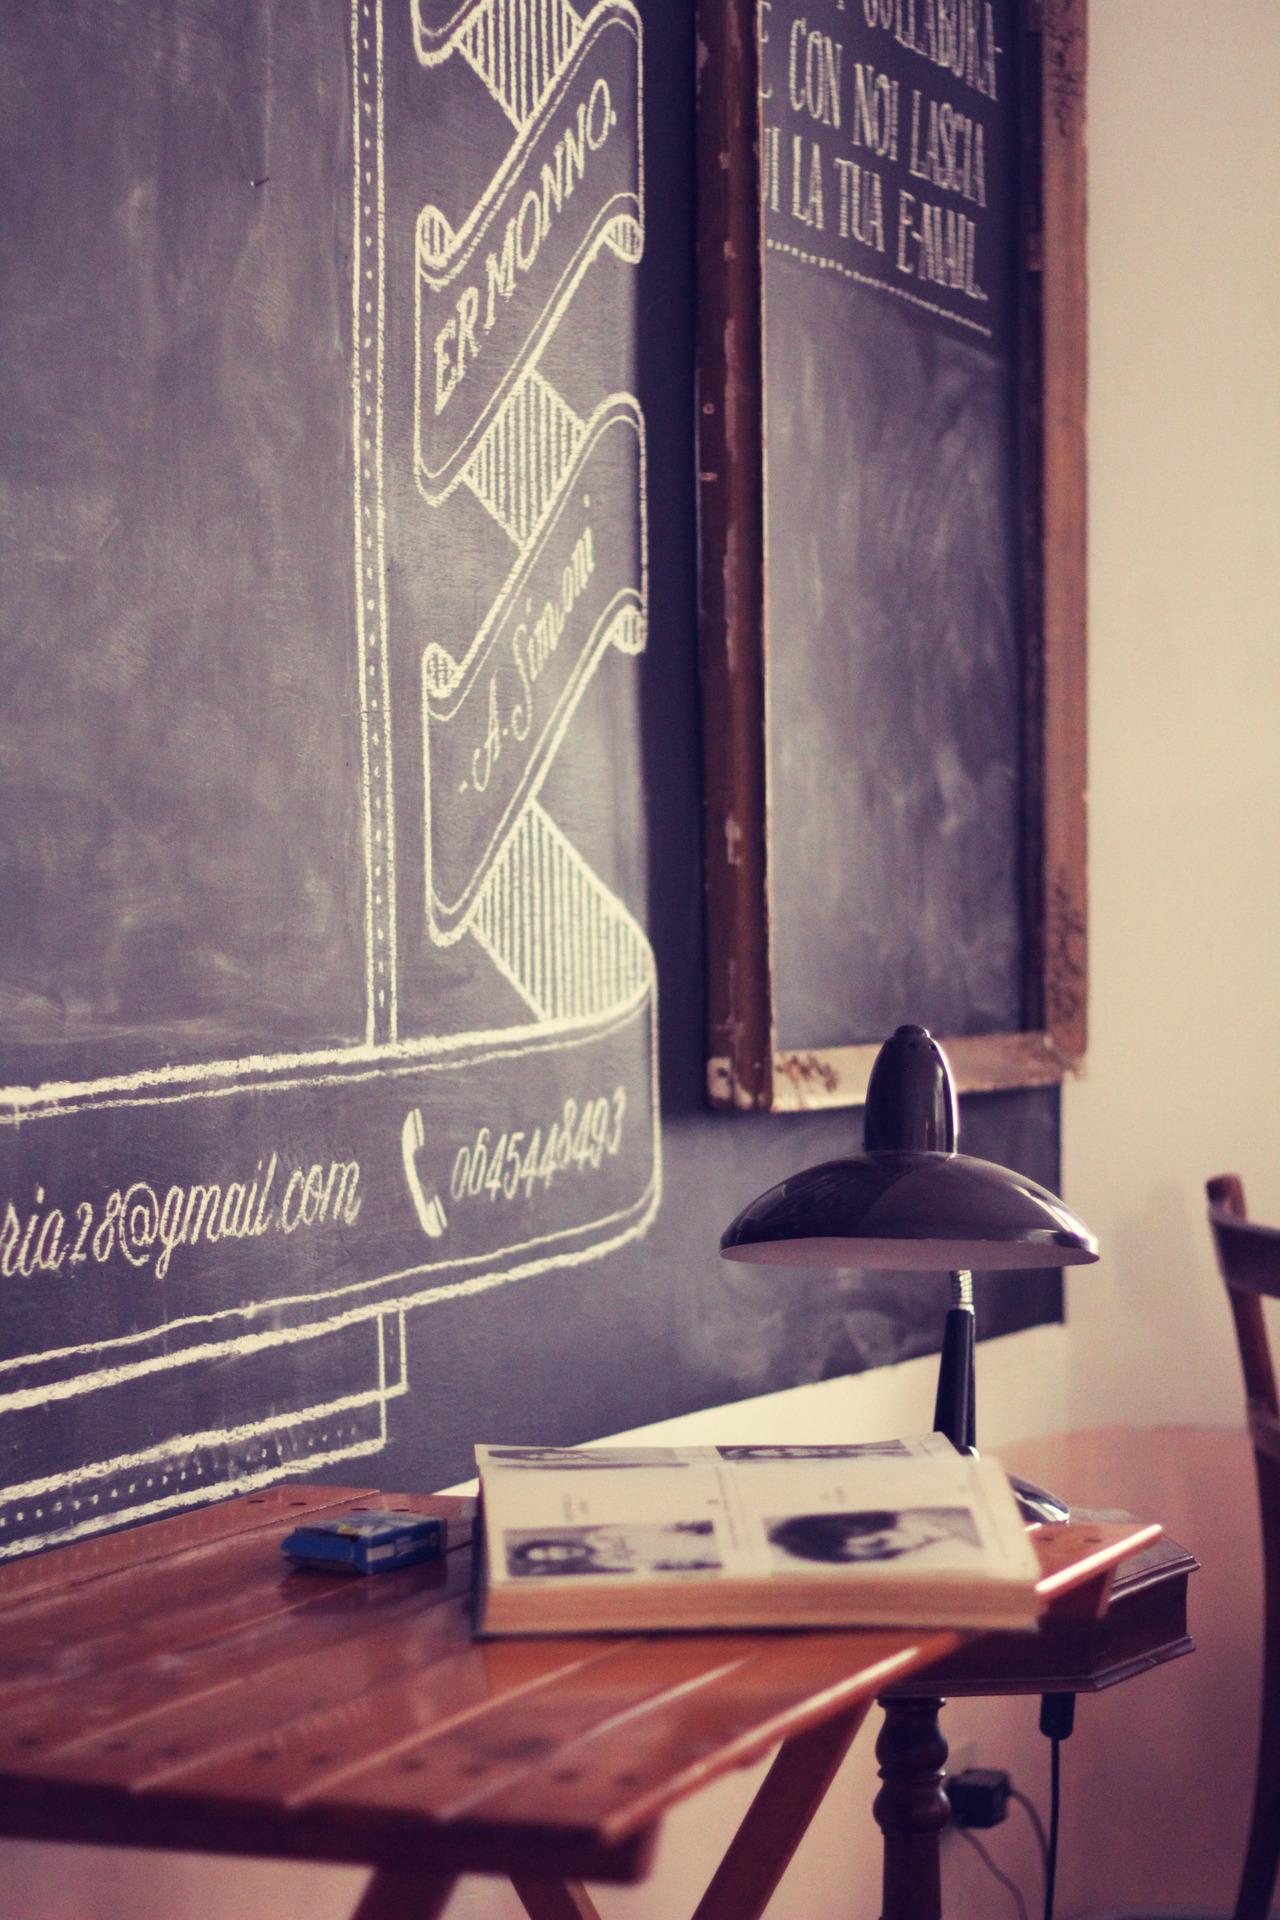 myidealhome:</p><br /> <p>chalkboard</p><br /> <p>